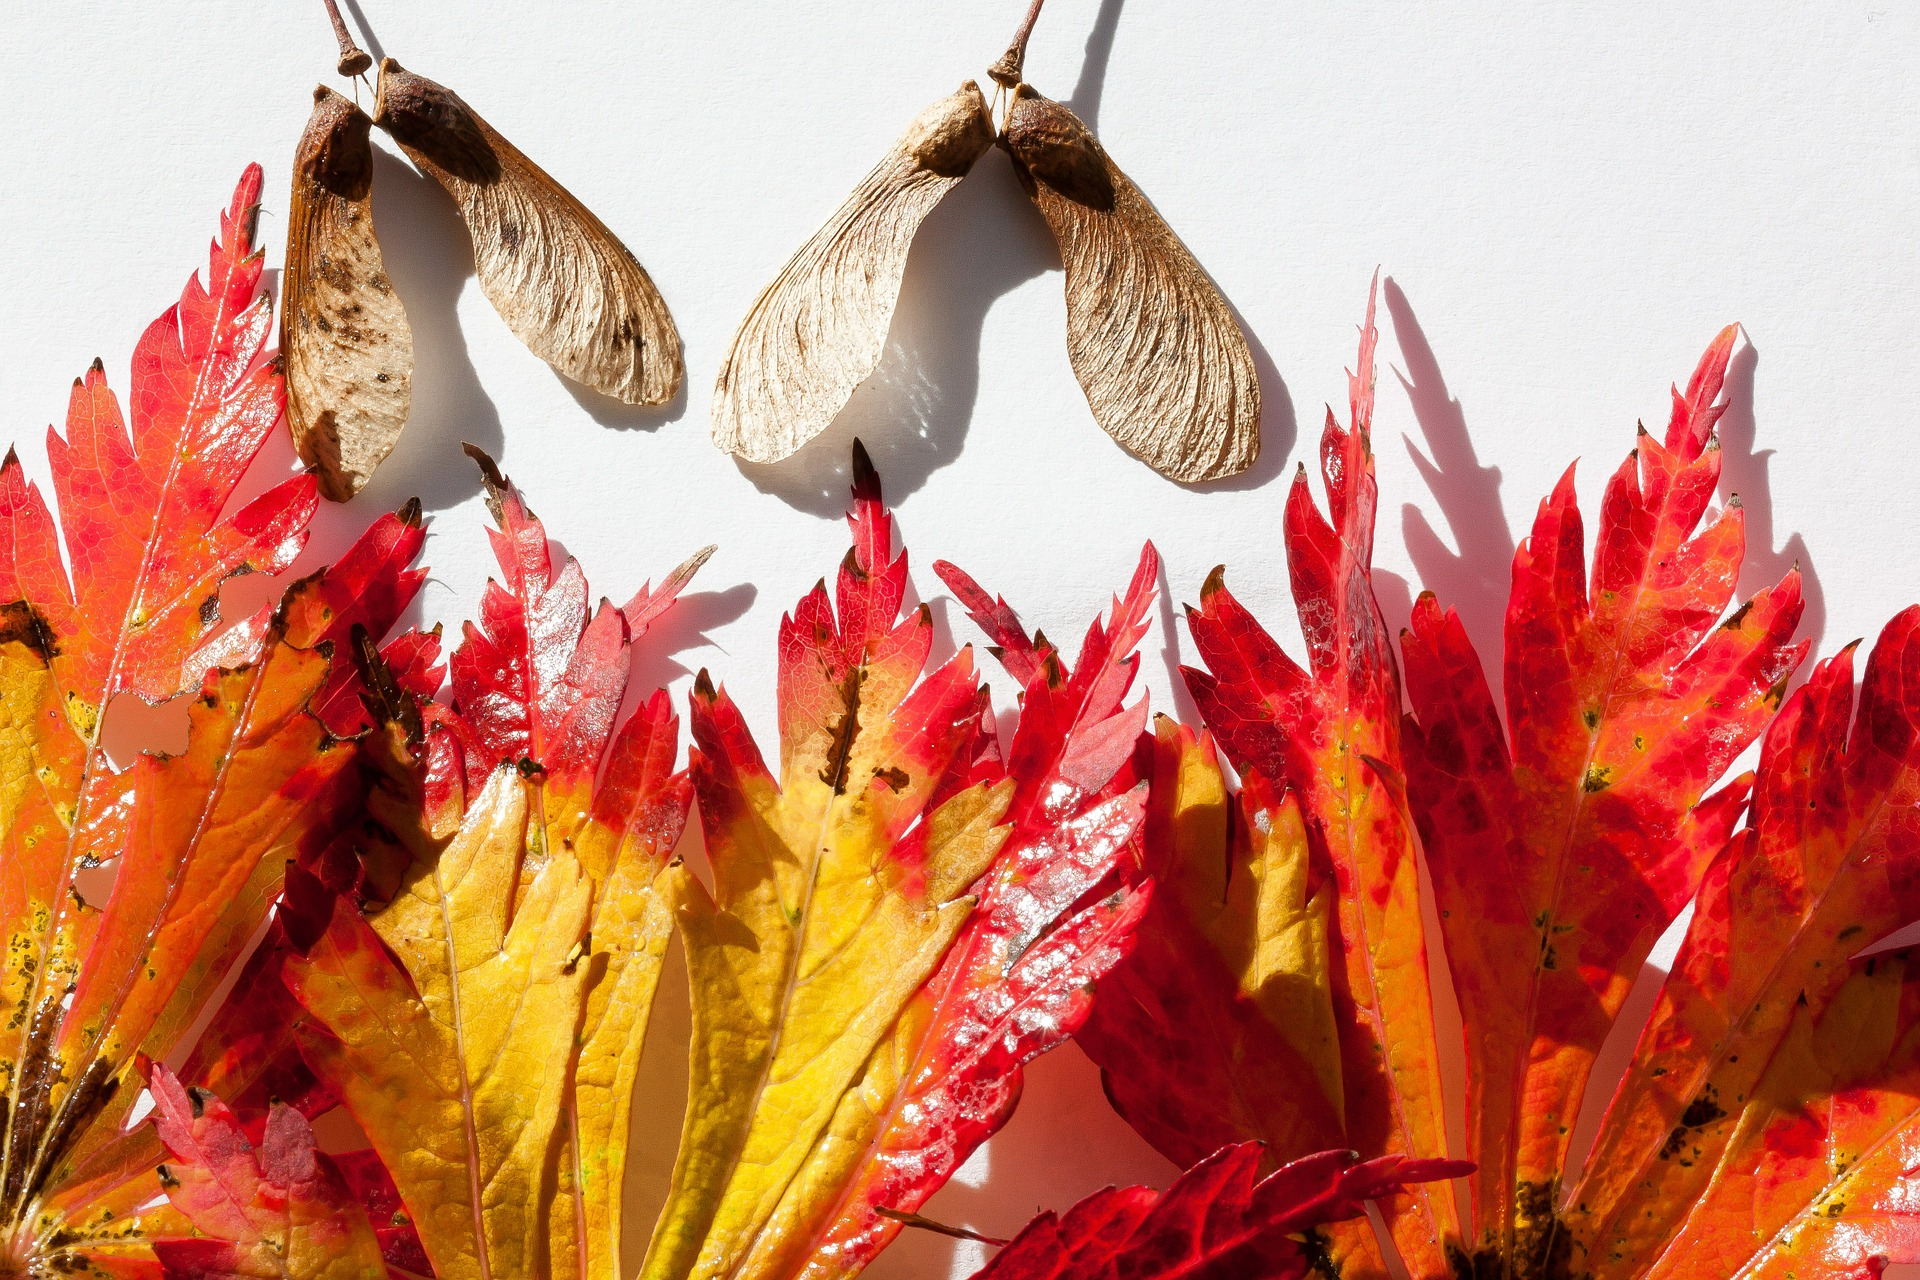 Japanese Maple, Japanese, Leaf, Leave, Maple, HQ Photo